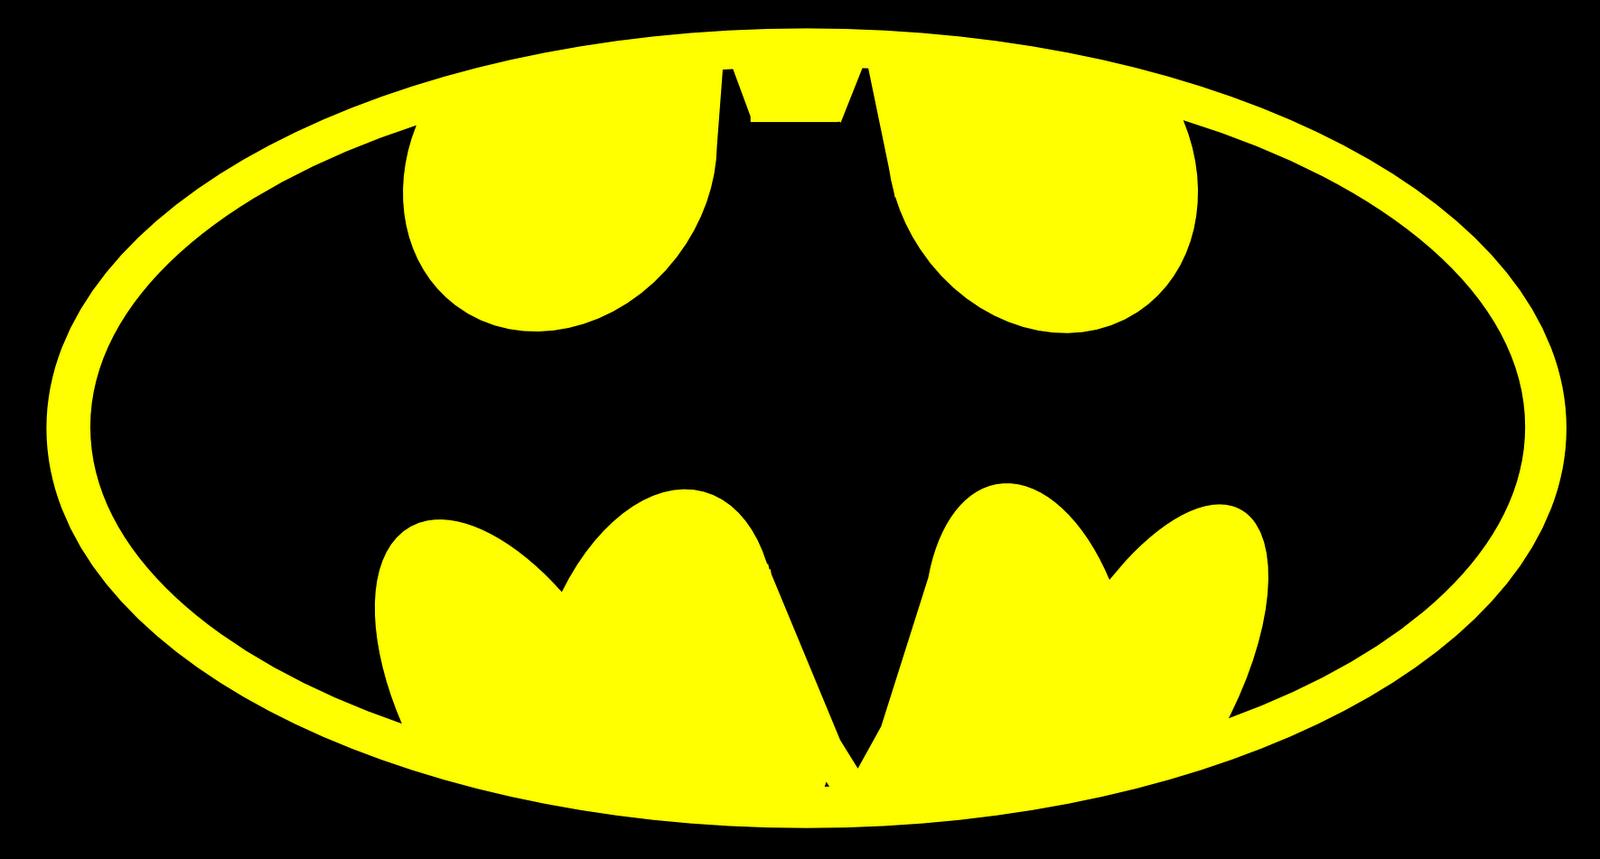 Drawn batman transparent background Printable Cliparting background 2 kid